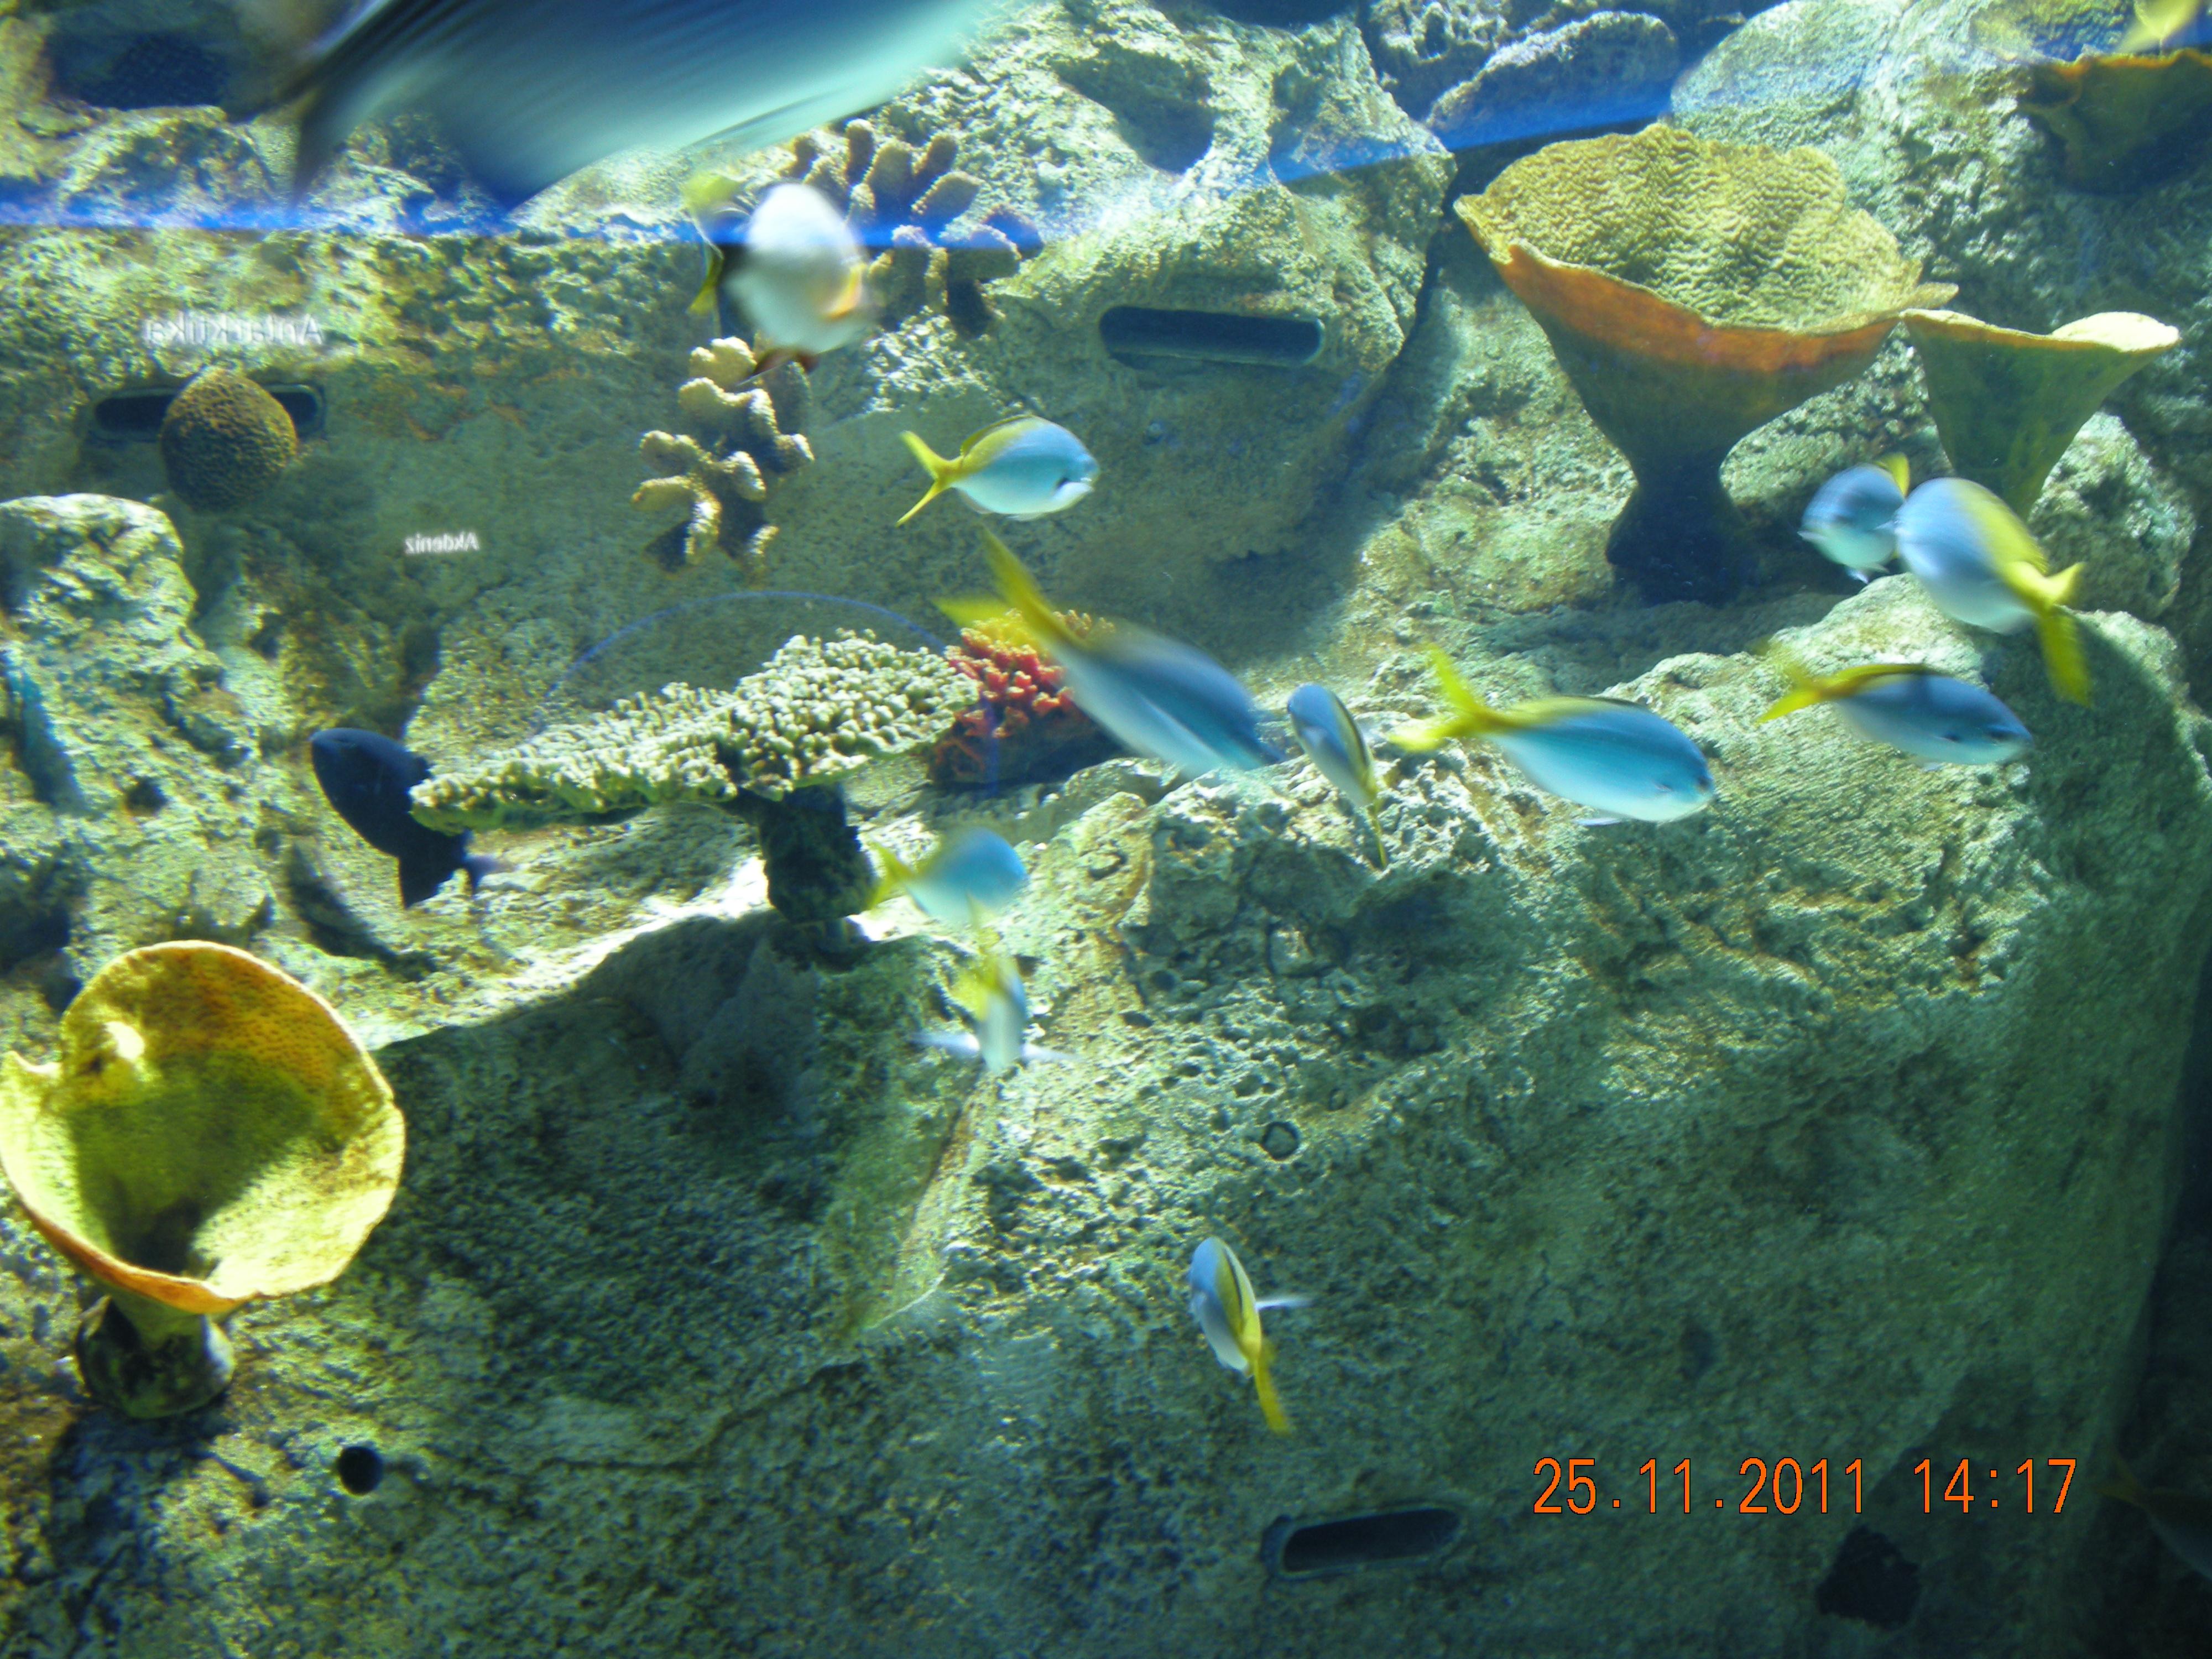 File:Istanbul Aquarium 57.jpg - Wikimedia Commons